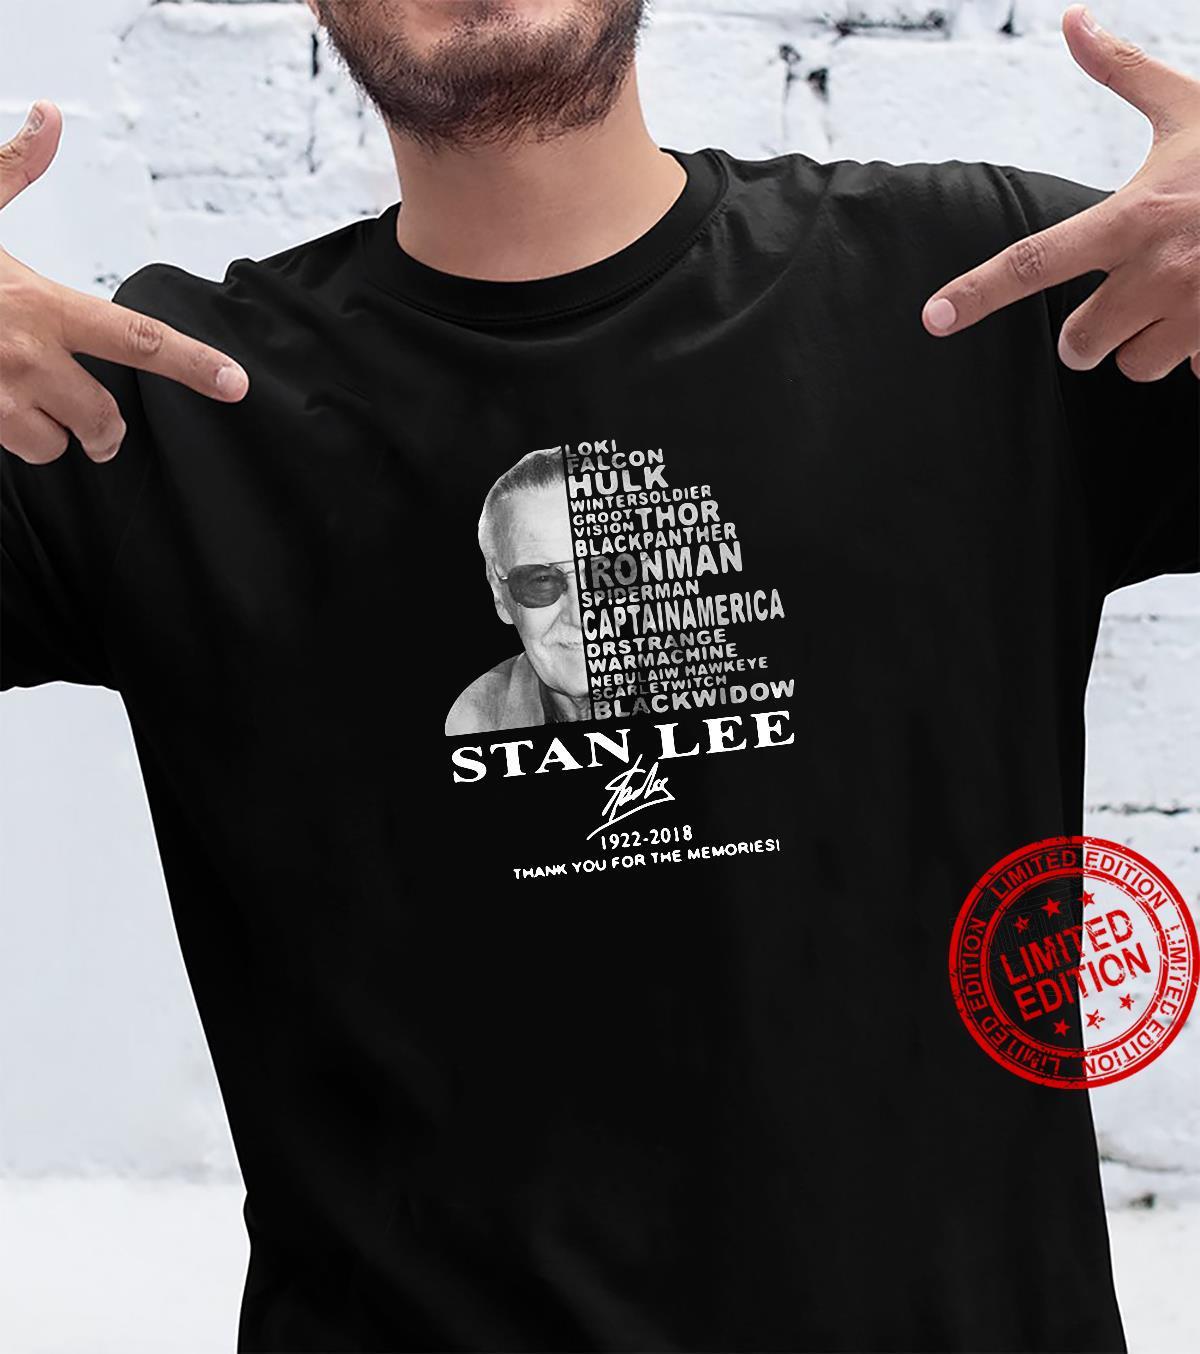 Stan Lee Loki falcon 1922-2018 thank you for the memories shirt